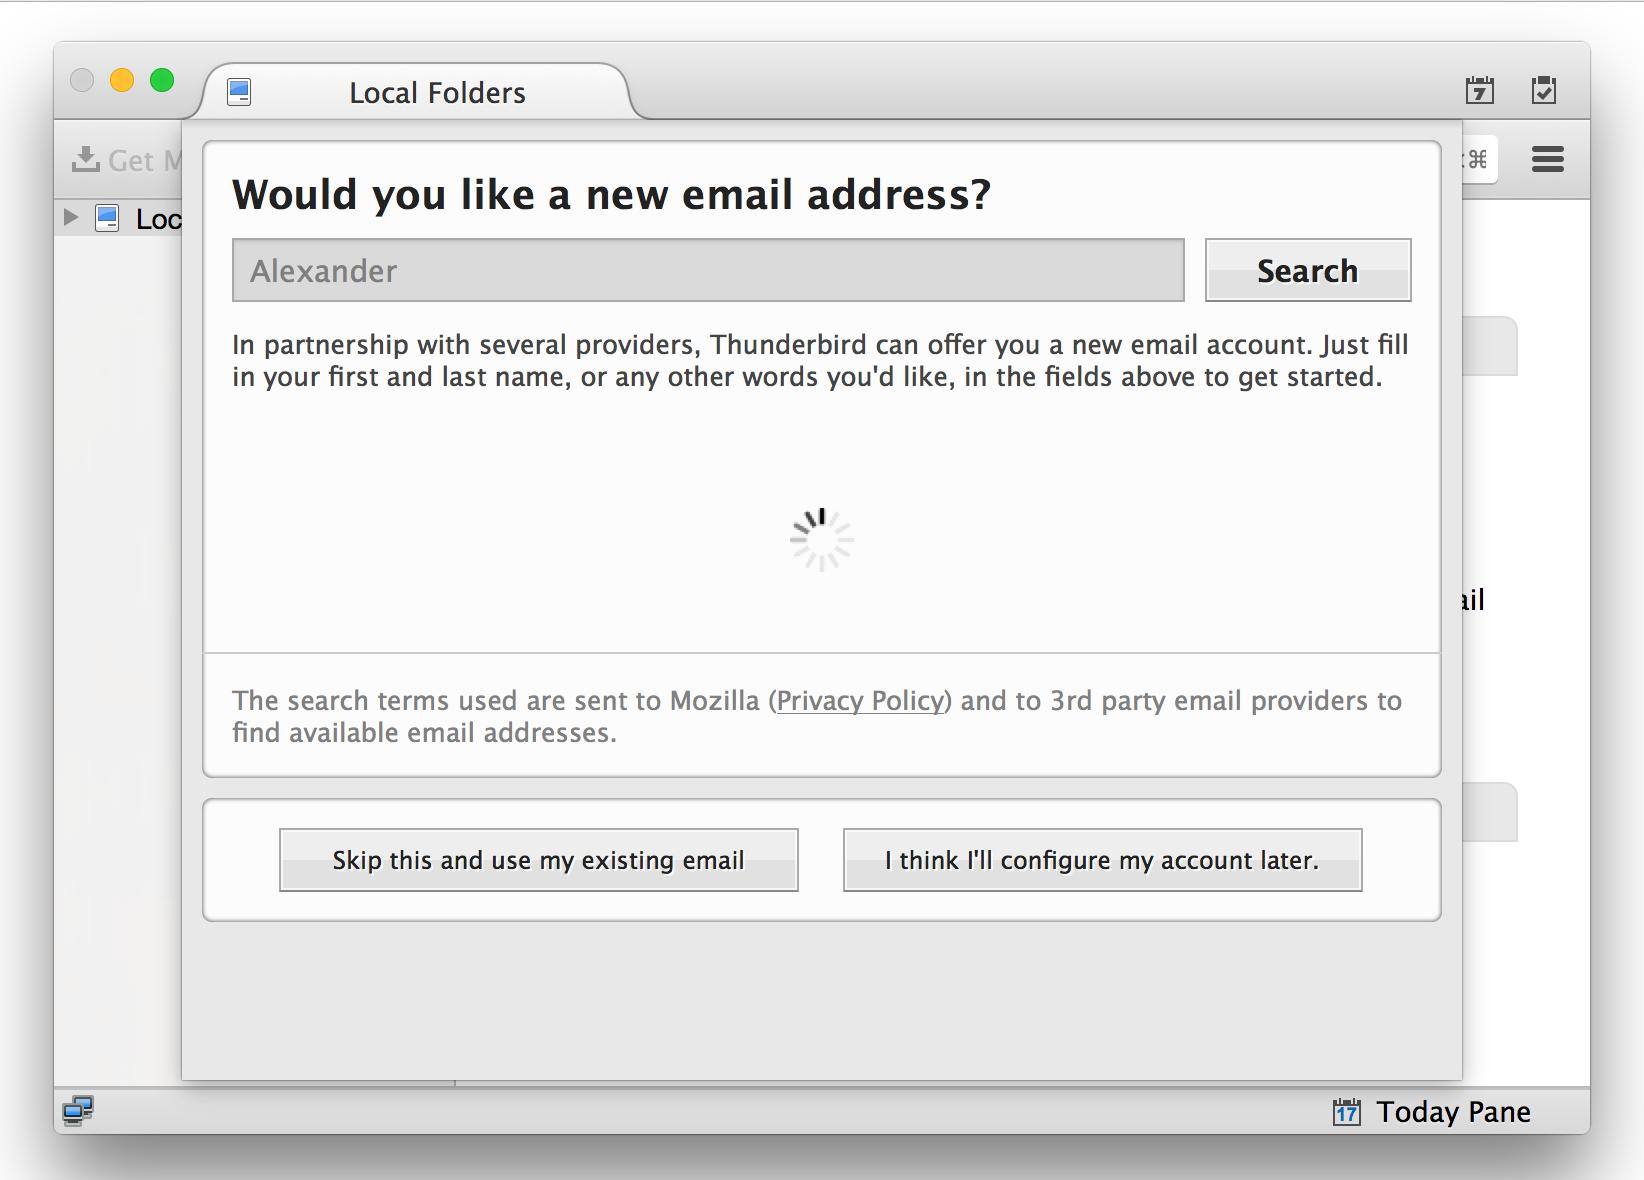 OAuth-авторизация в Mozilla Thunderbird: от зарождения до релиза - 7